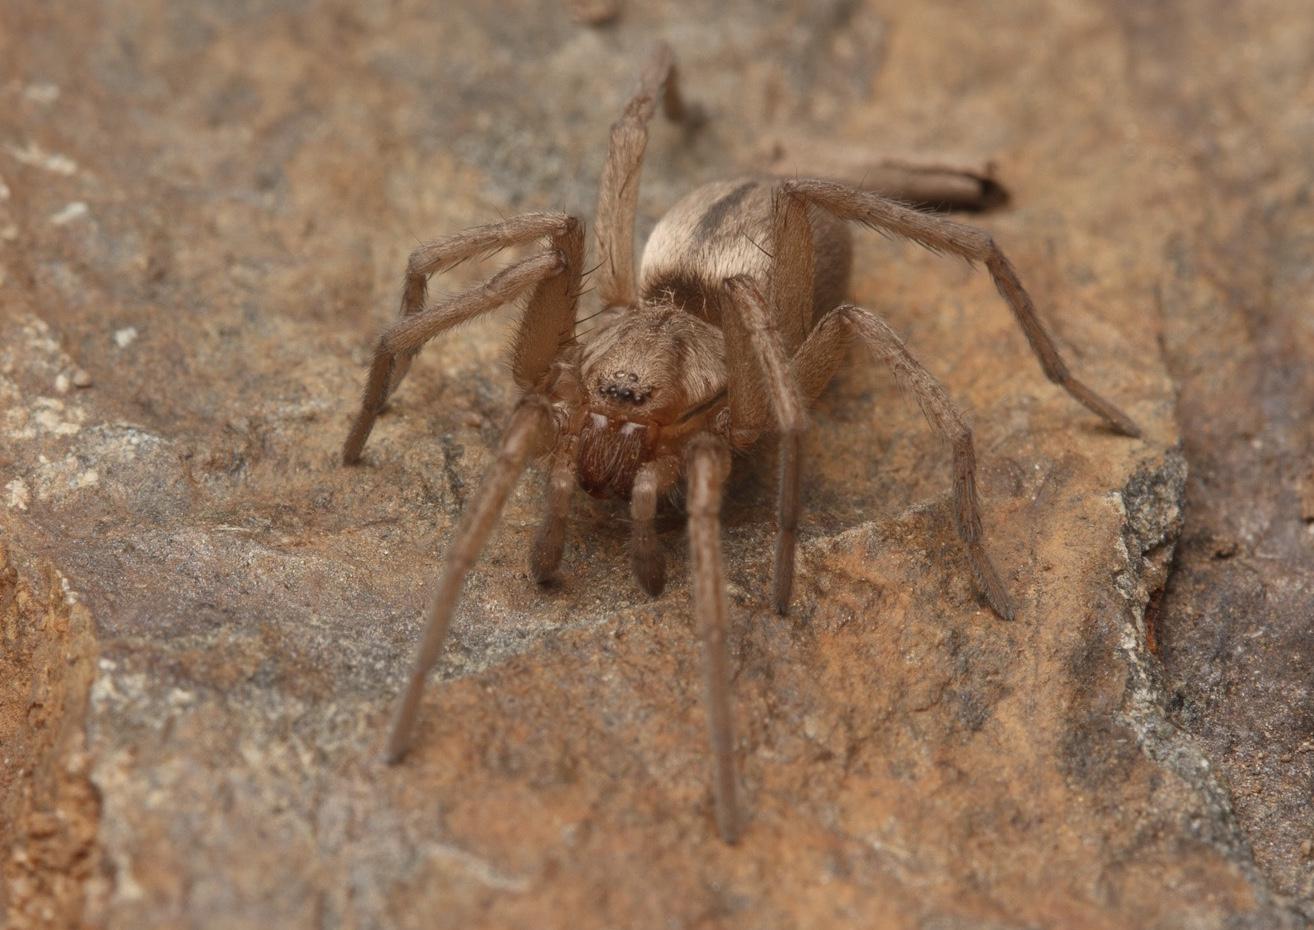 Sac_spider_IMG_9934